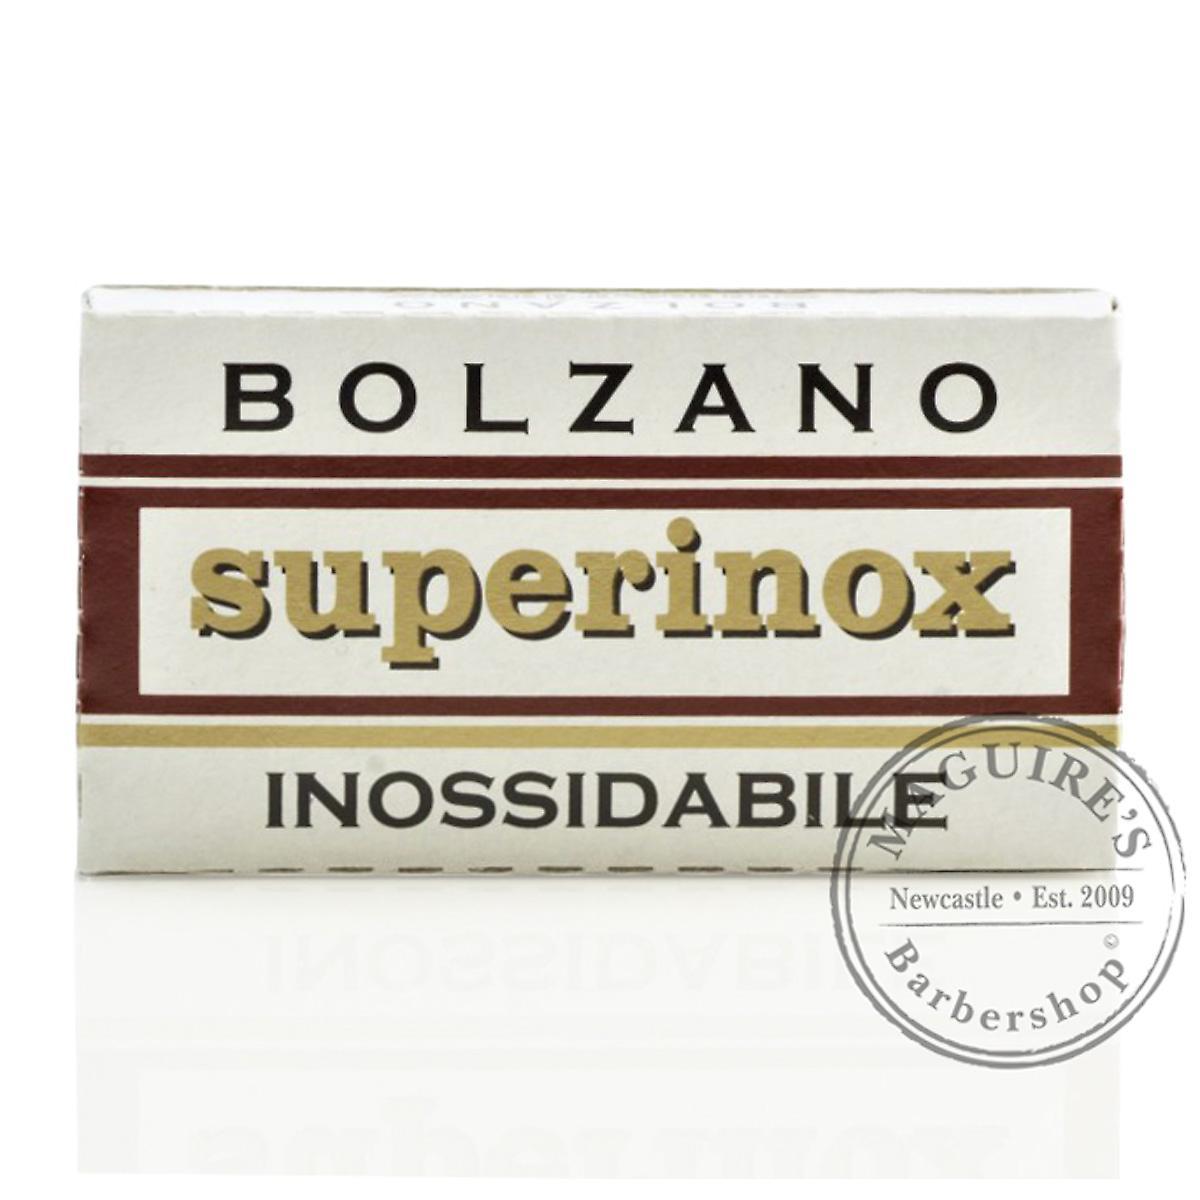 Bolzano Superinox Inossidabile Double Edge (DE) Razorblade